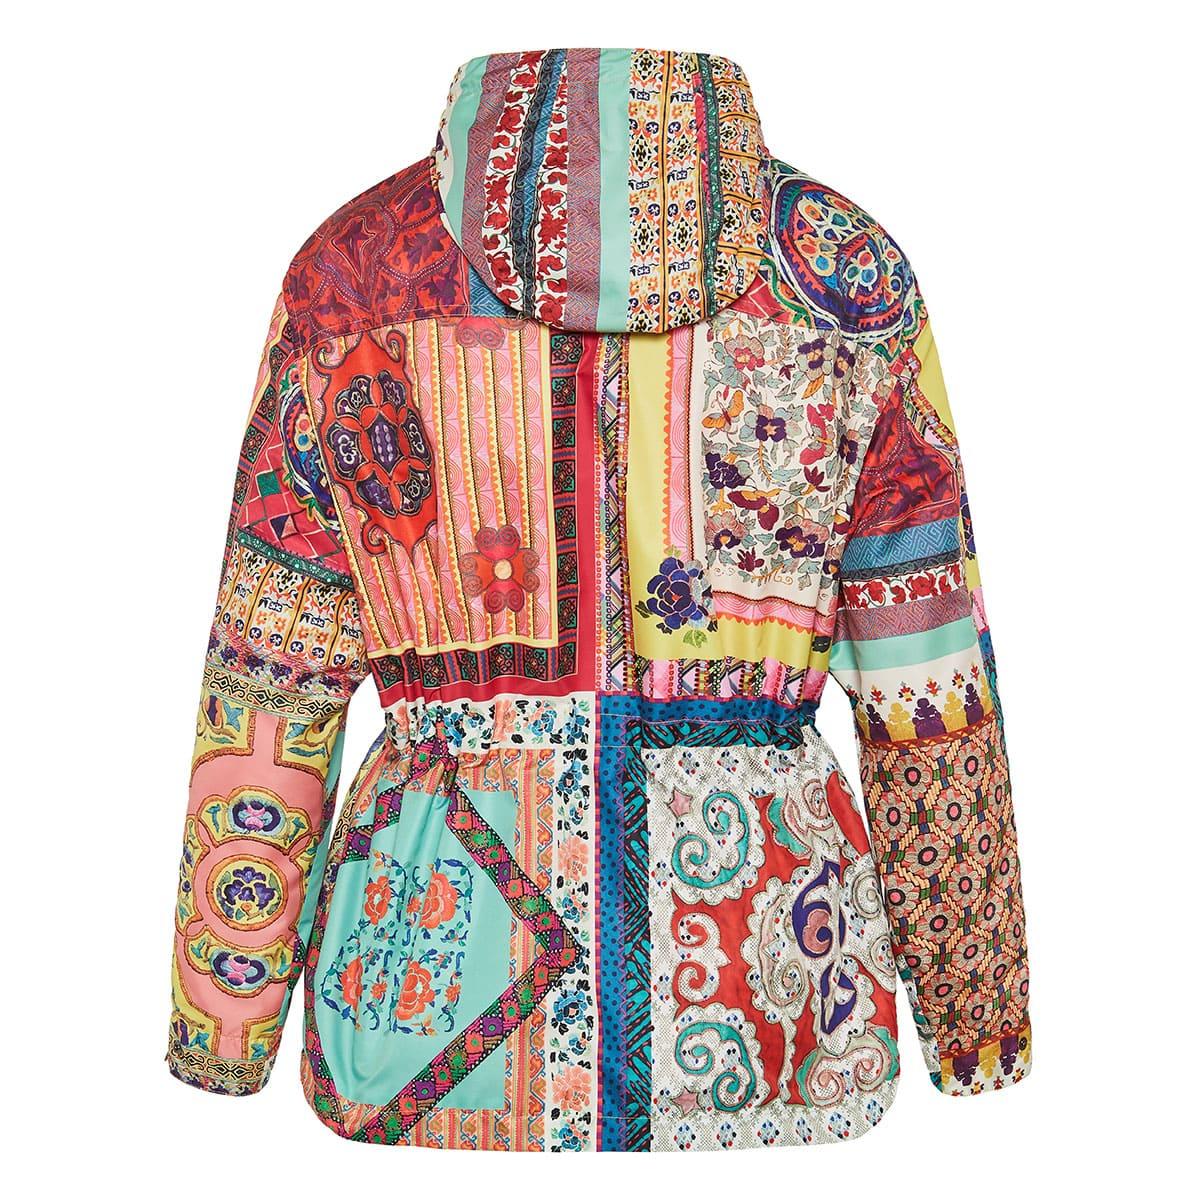 Printed nylon jacket